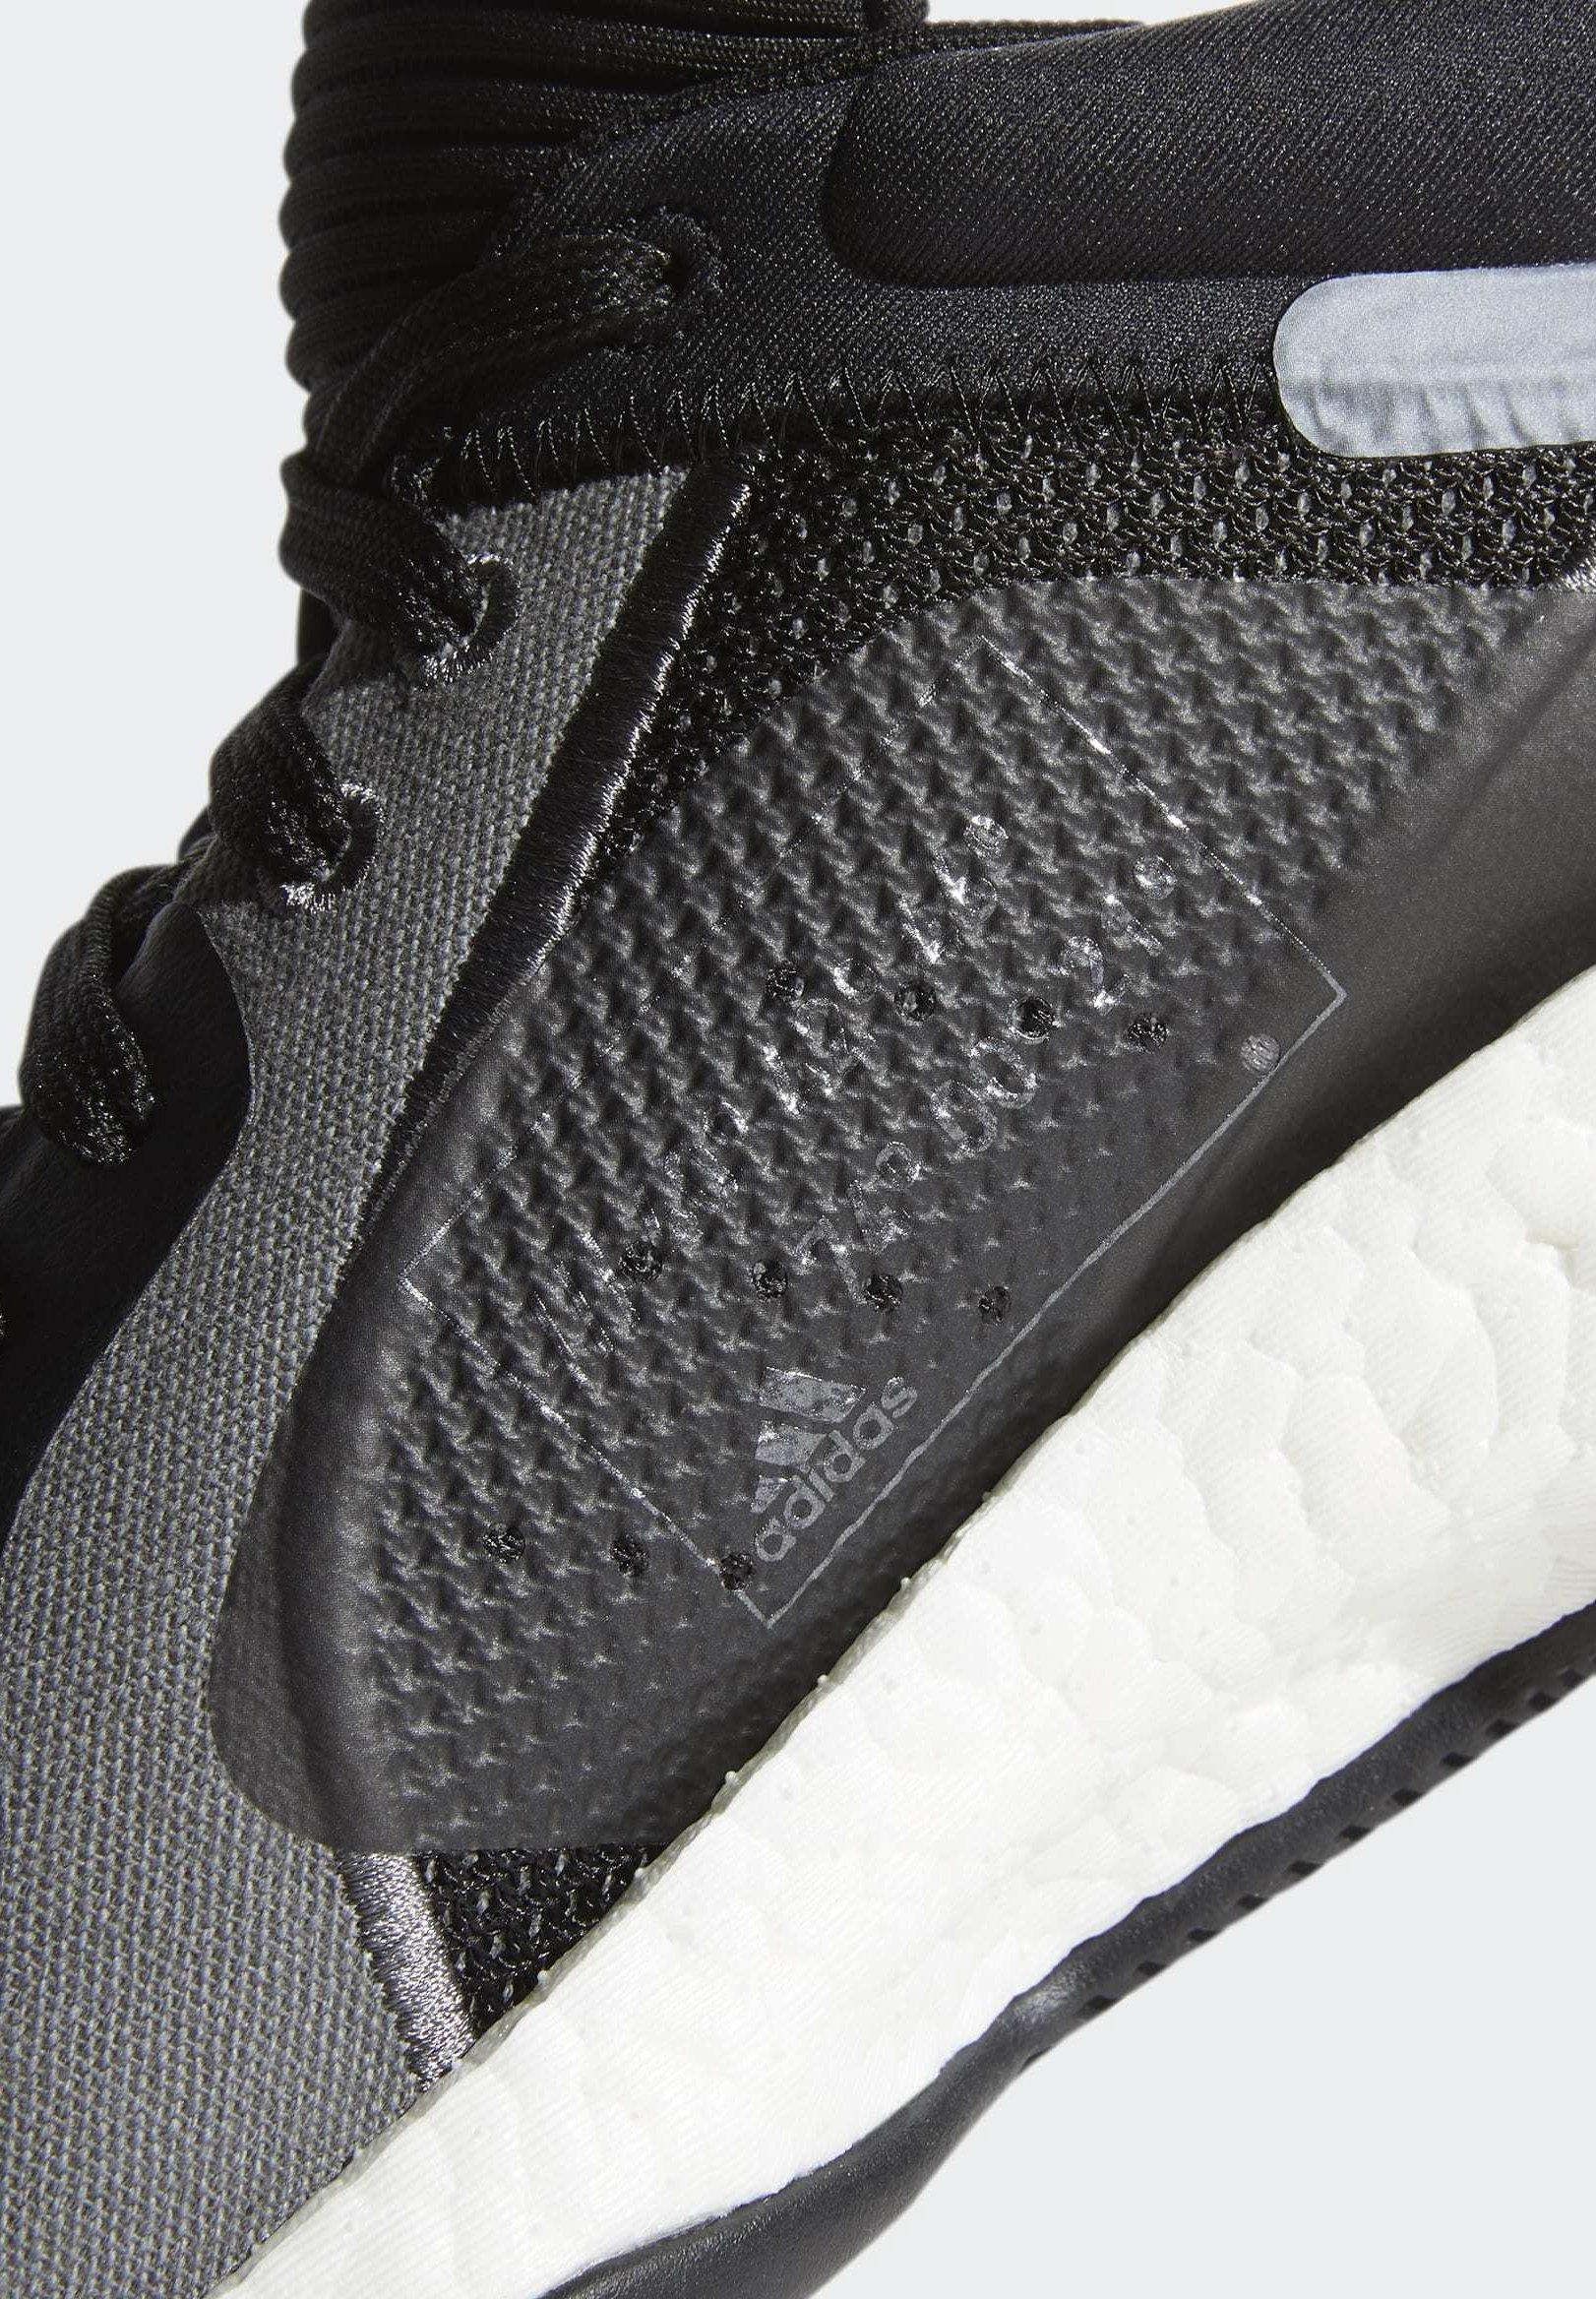 adidas Performance MARQUEE BOOST LOW SHOES - Basketballschuh - black/schwarz - Herrenschuhe sjaoc